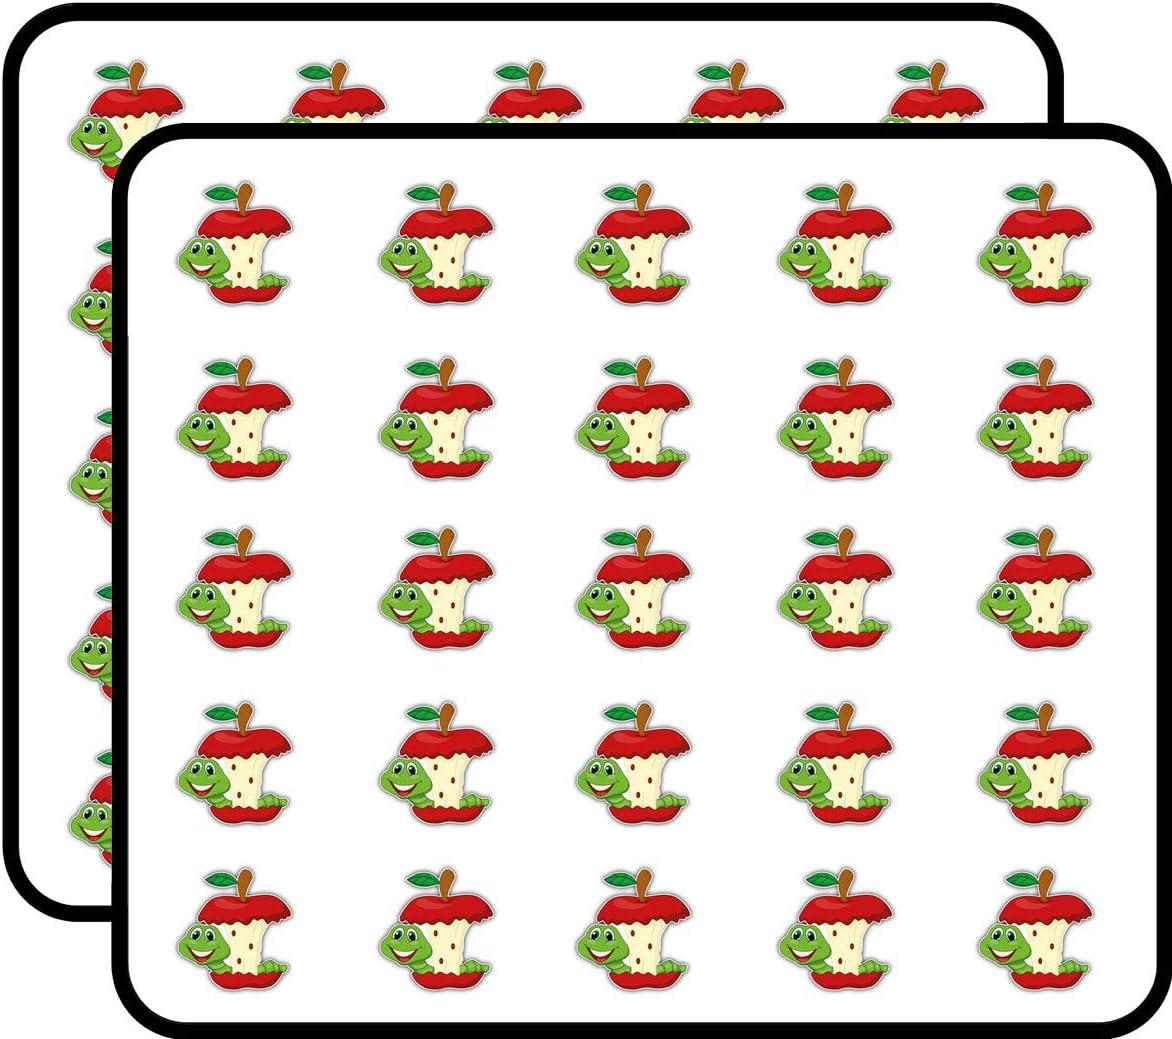 Worm Eating Apple Cartoon Art Decor Sticker for Scrapbooking, Calendars, Arts, Kids DIY Crafts, Album, Bullet Journals 50 Pack